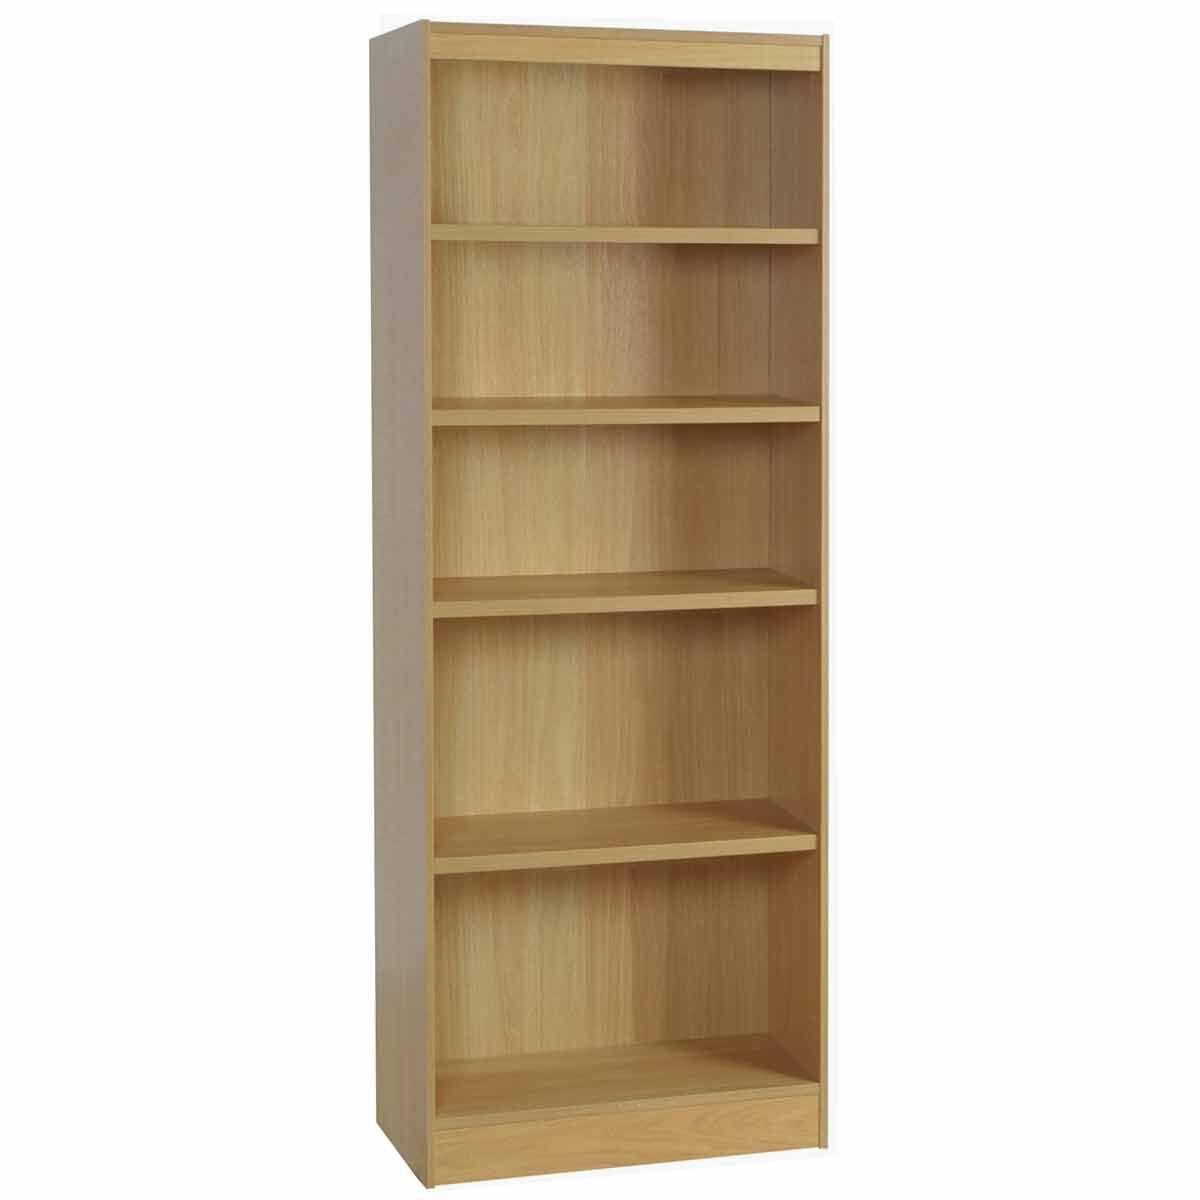 R White Tall Bookcase 600mm Wide Classic Oak